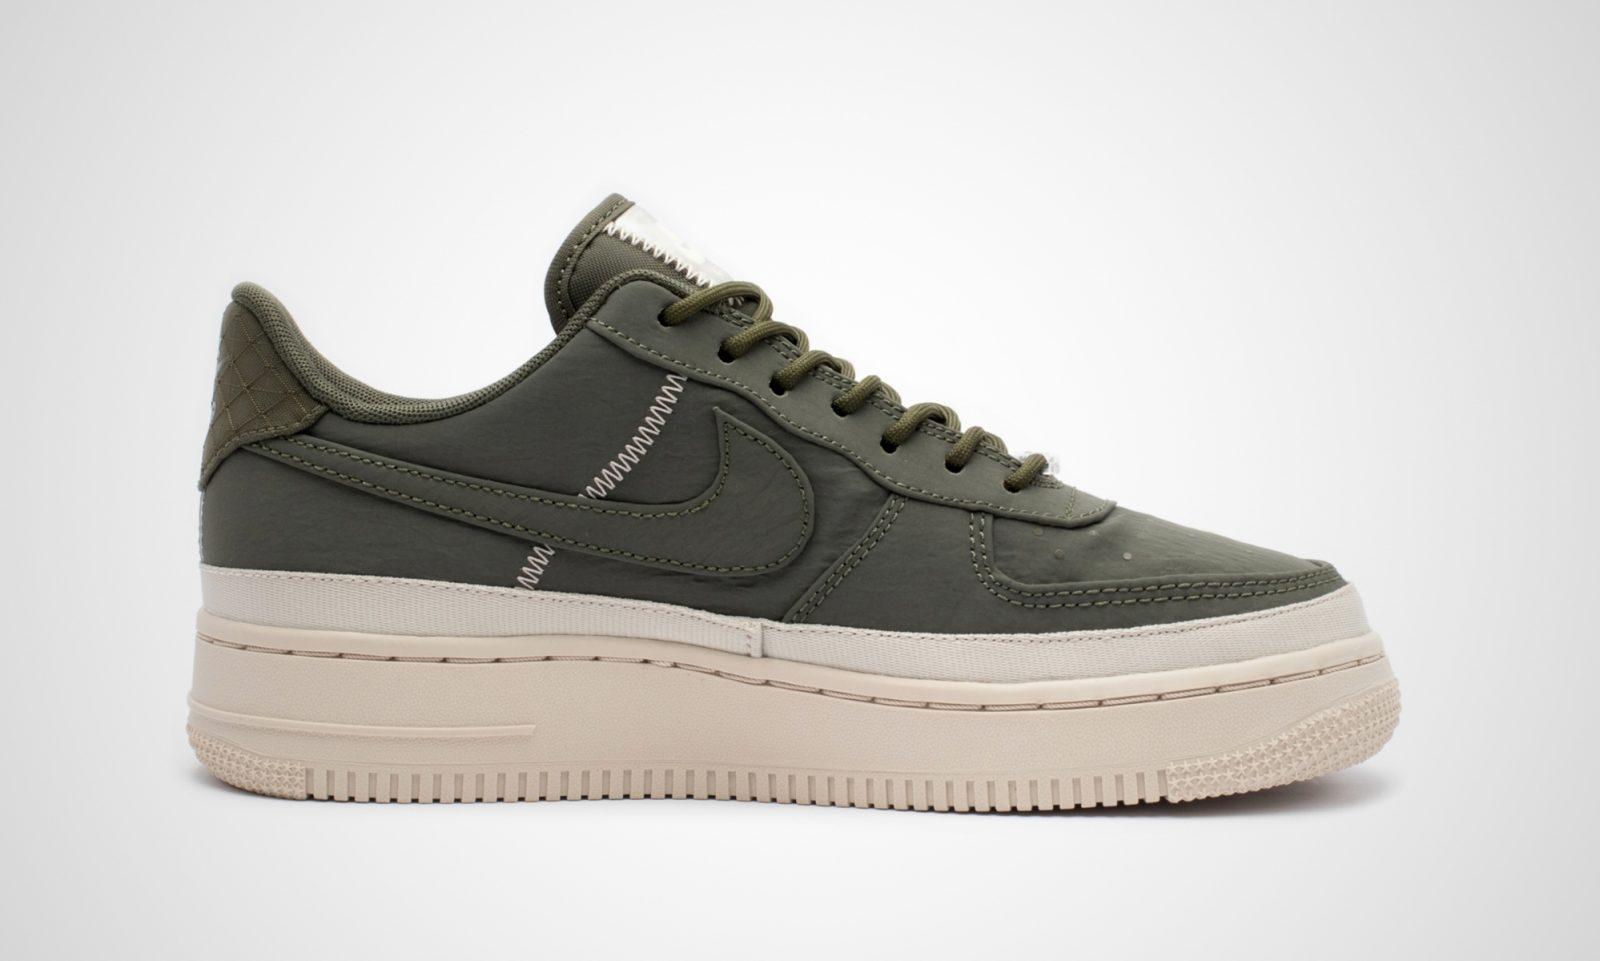 Nike Air Force 1 07 Shoes AA0287 001